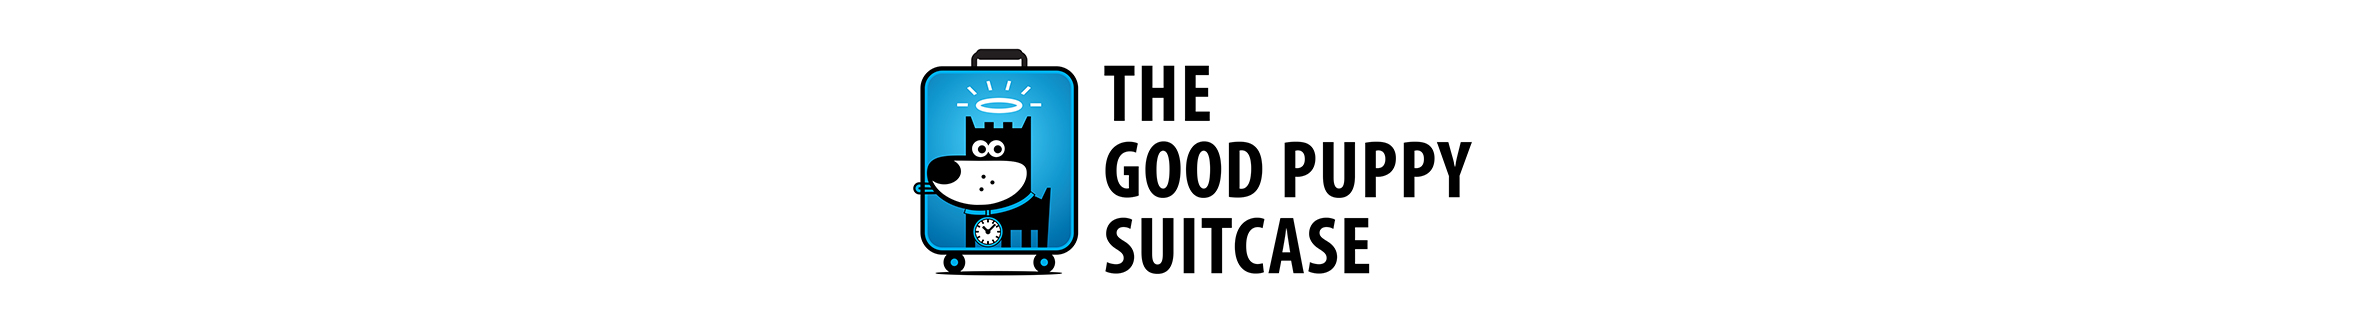 GP-SUITCASE-Icon-Bar-01-S.jpg